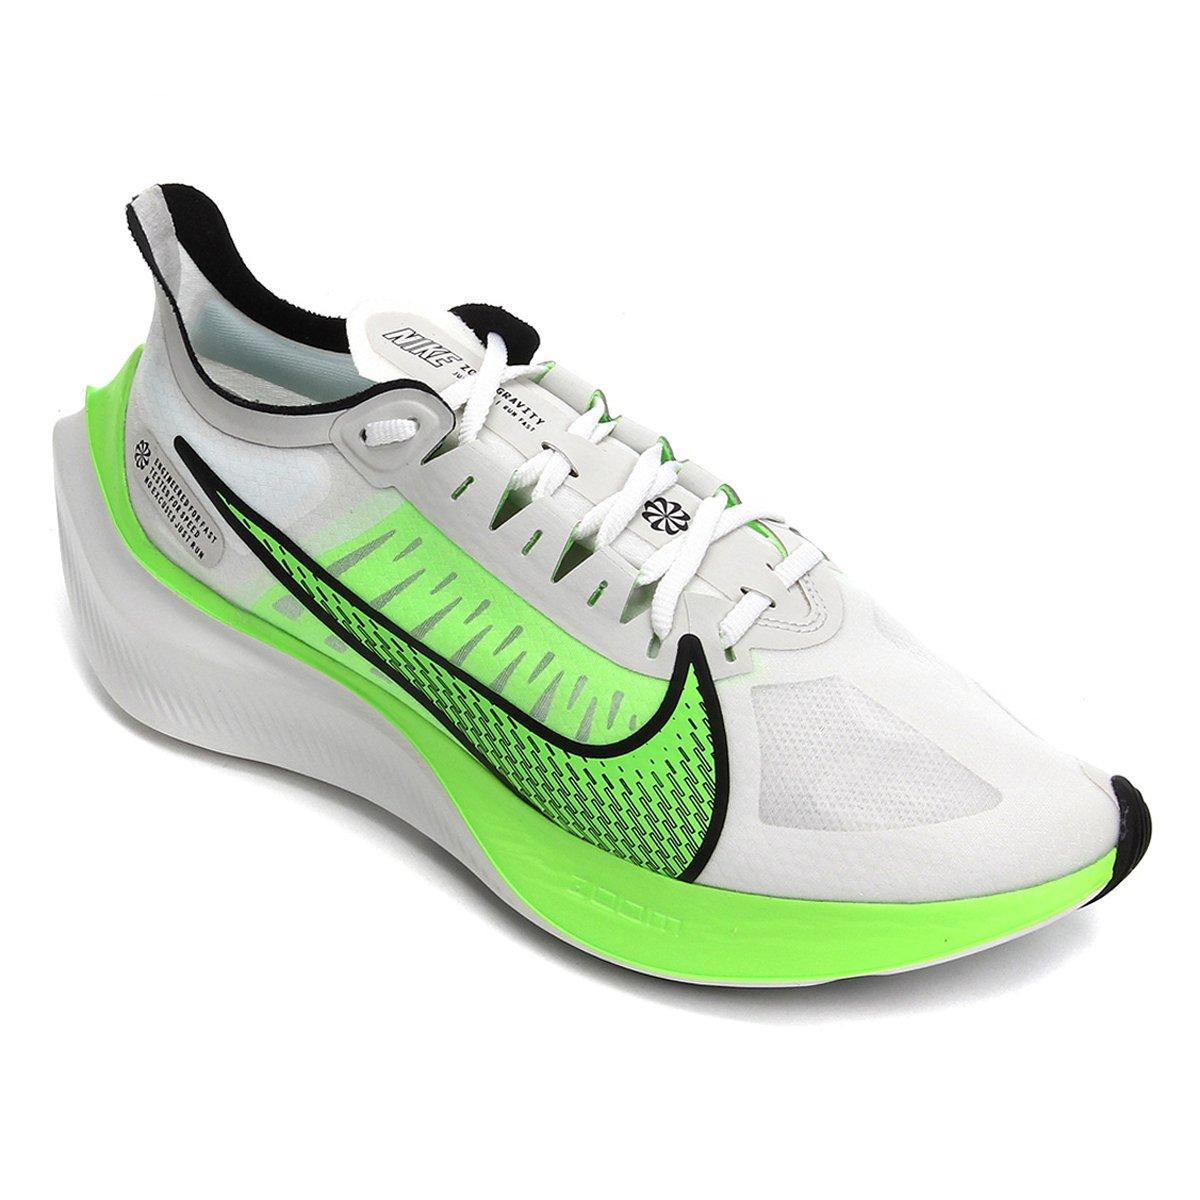 super popular linda zapatos elegantes nike verde